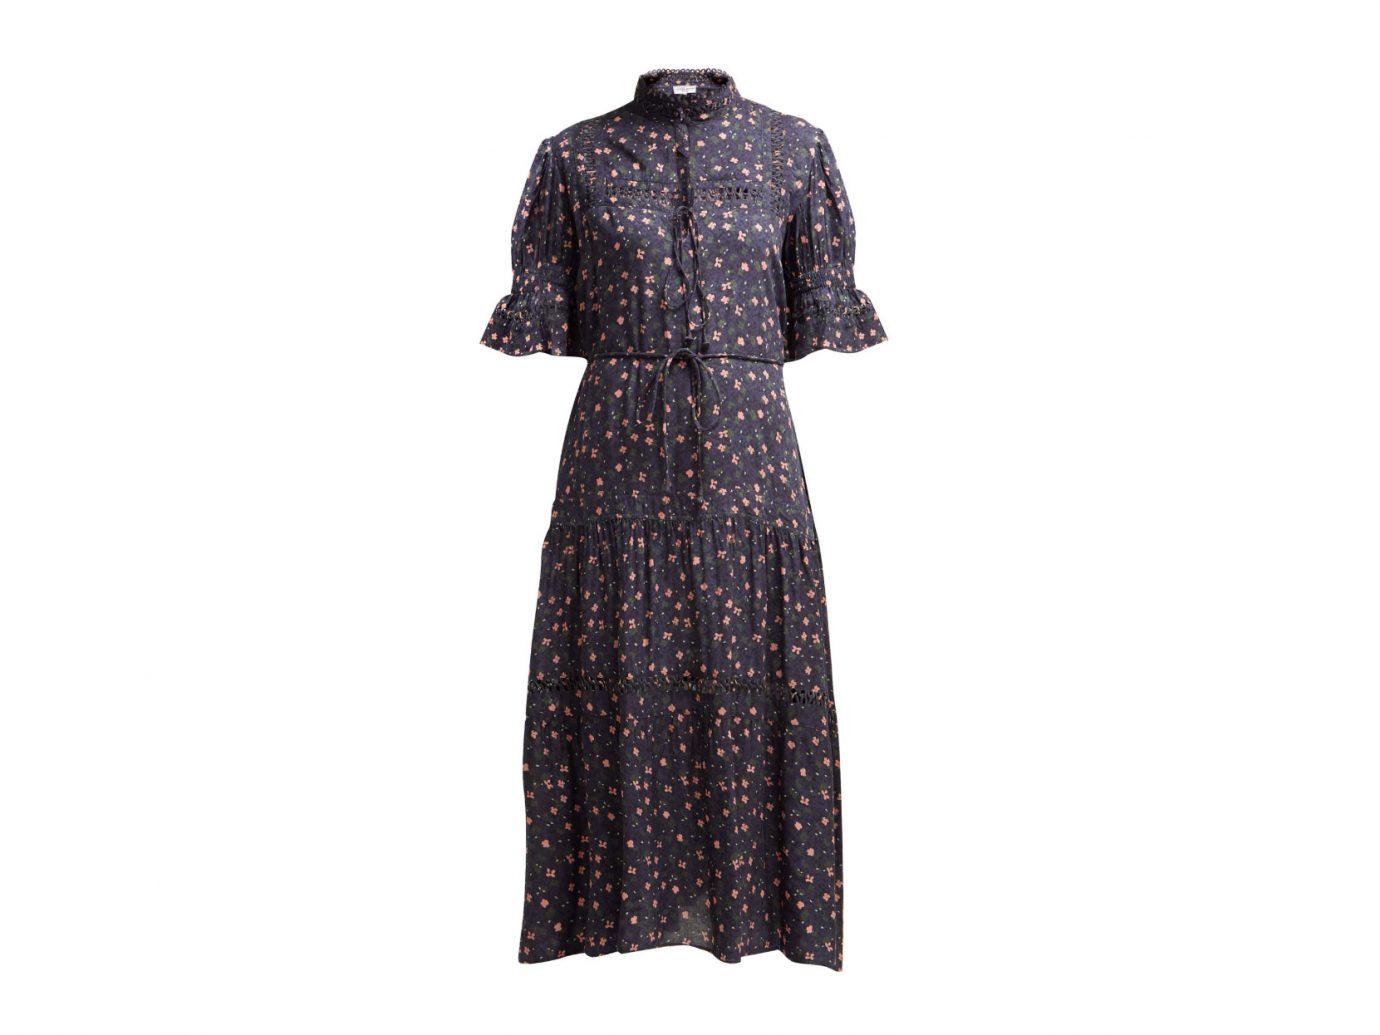 Apiece Apart Los Altos floral-print dress